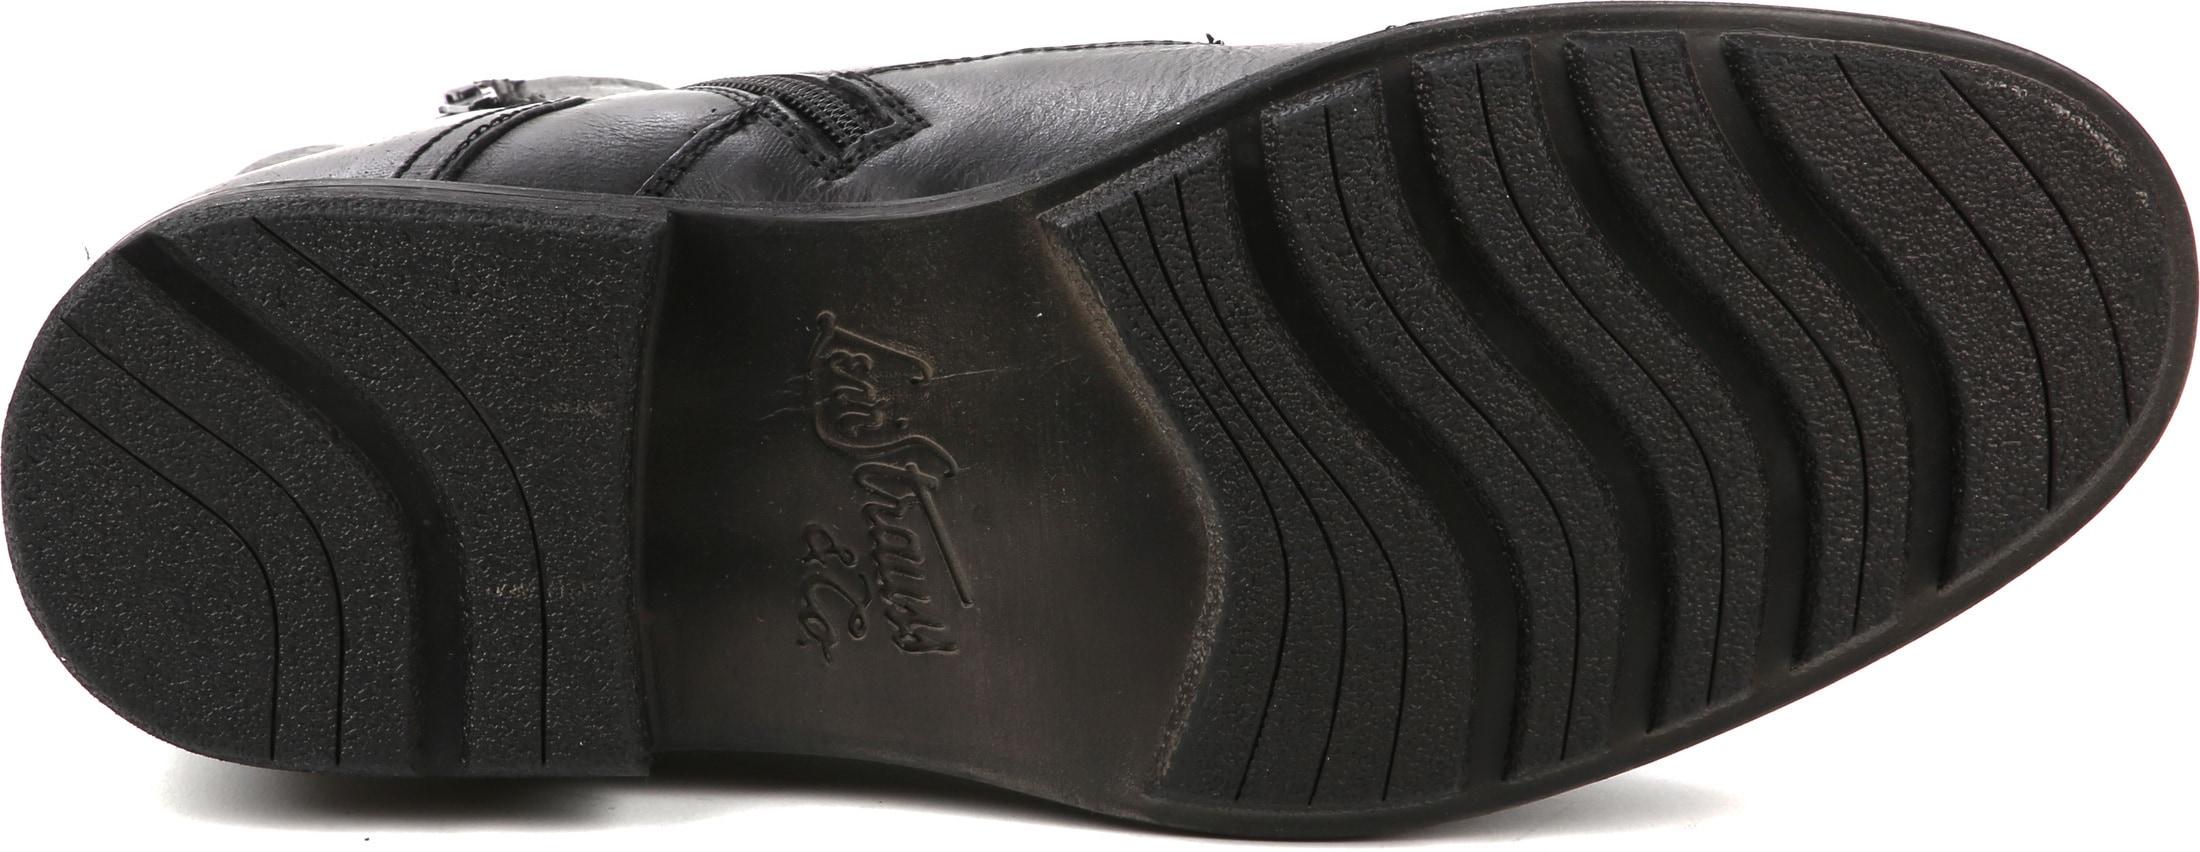 Levi's Boots Reddinger Zwart foto 4